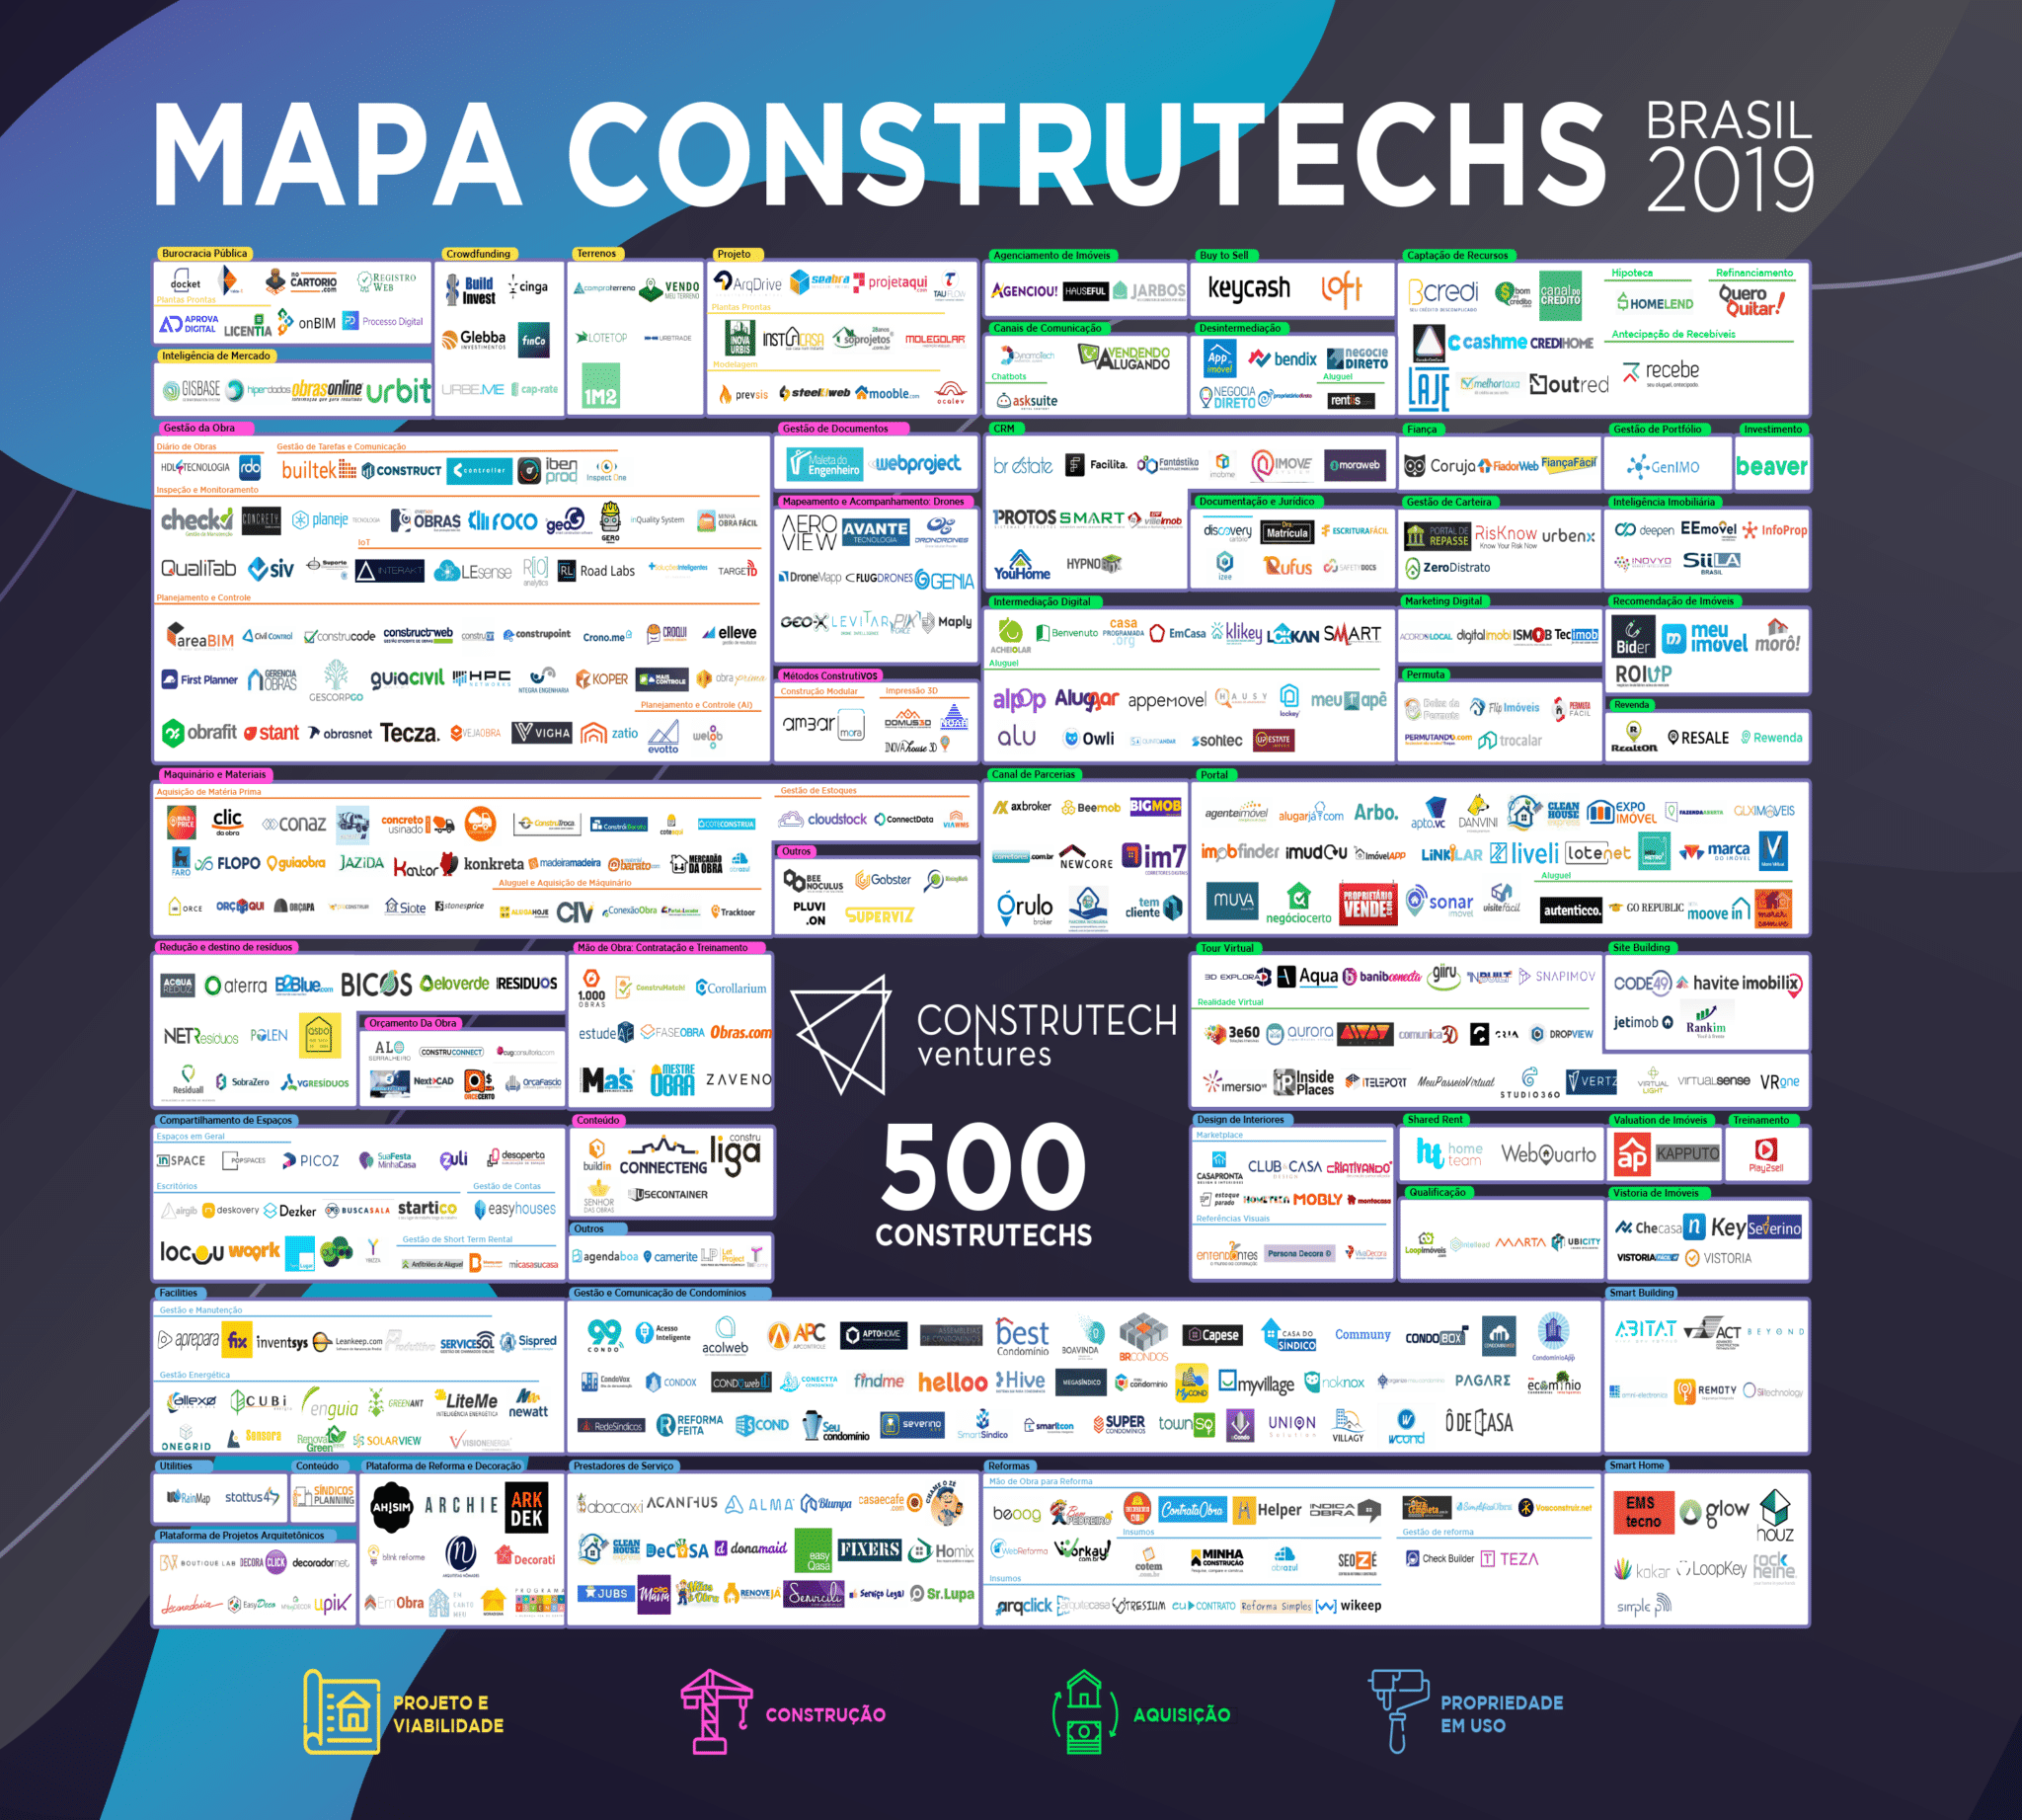 Mapa 500 Construtechs Brasil 2019 - Construtech Ventures